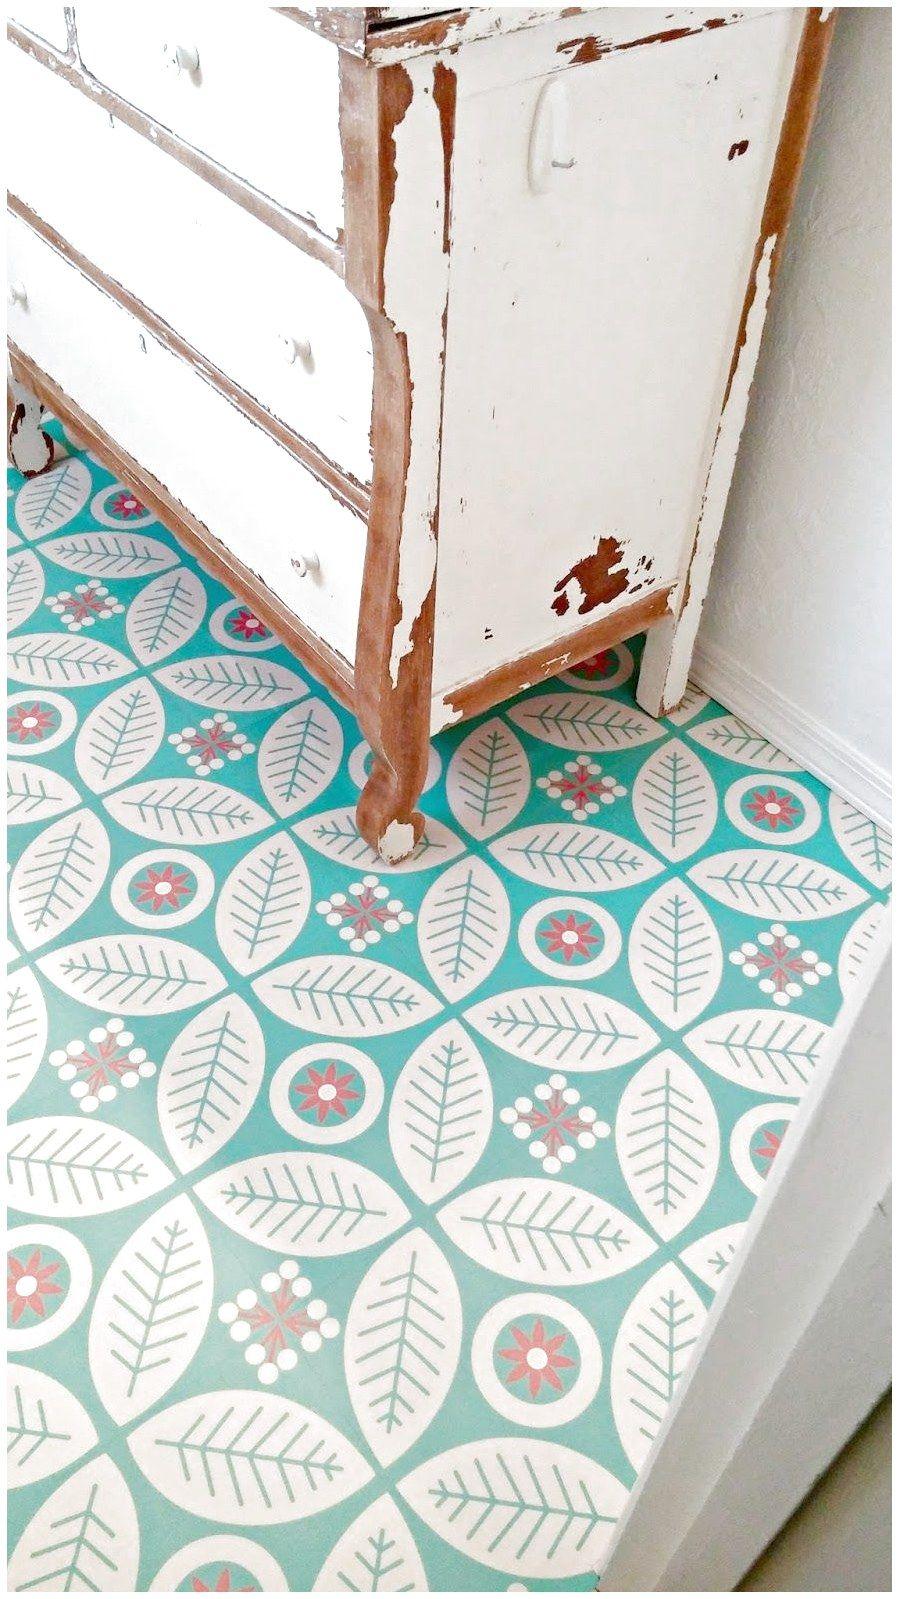 Self Adhesive Vinyl Floor Tiles From Mirth Studios Modernflooring Flooringideas Click Now For Info Vinyl Tile Flooring Vinyl Flooring Bath Redo